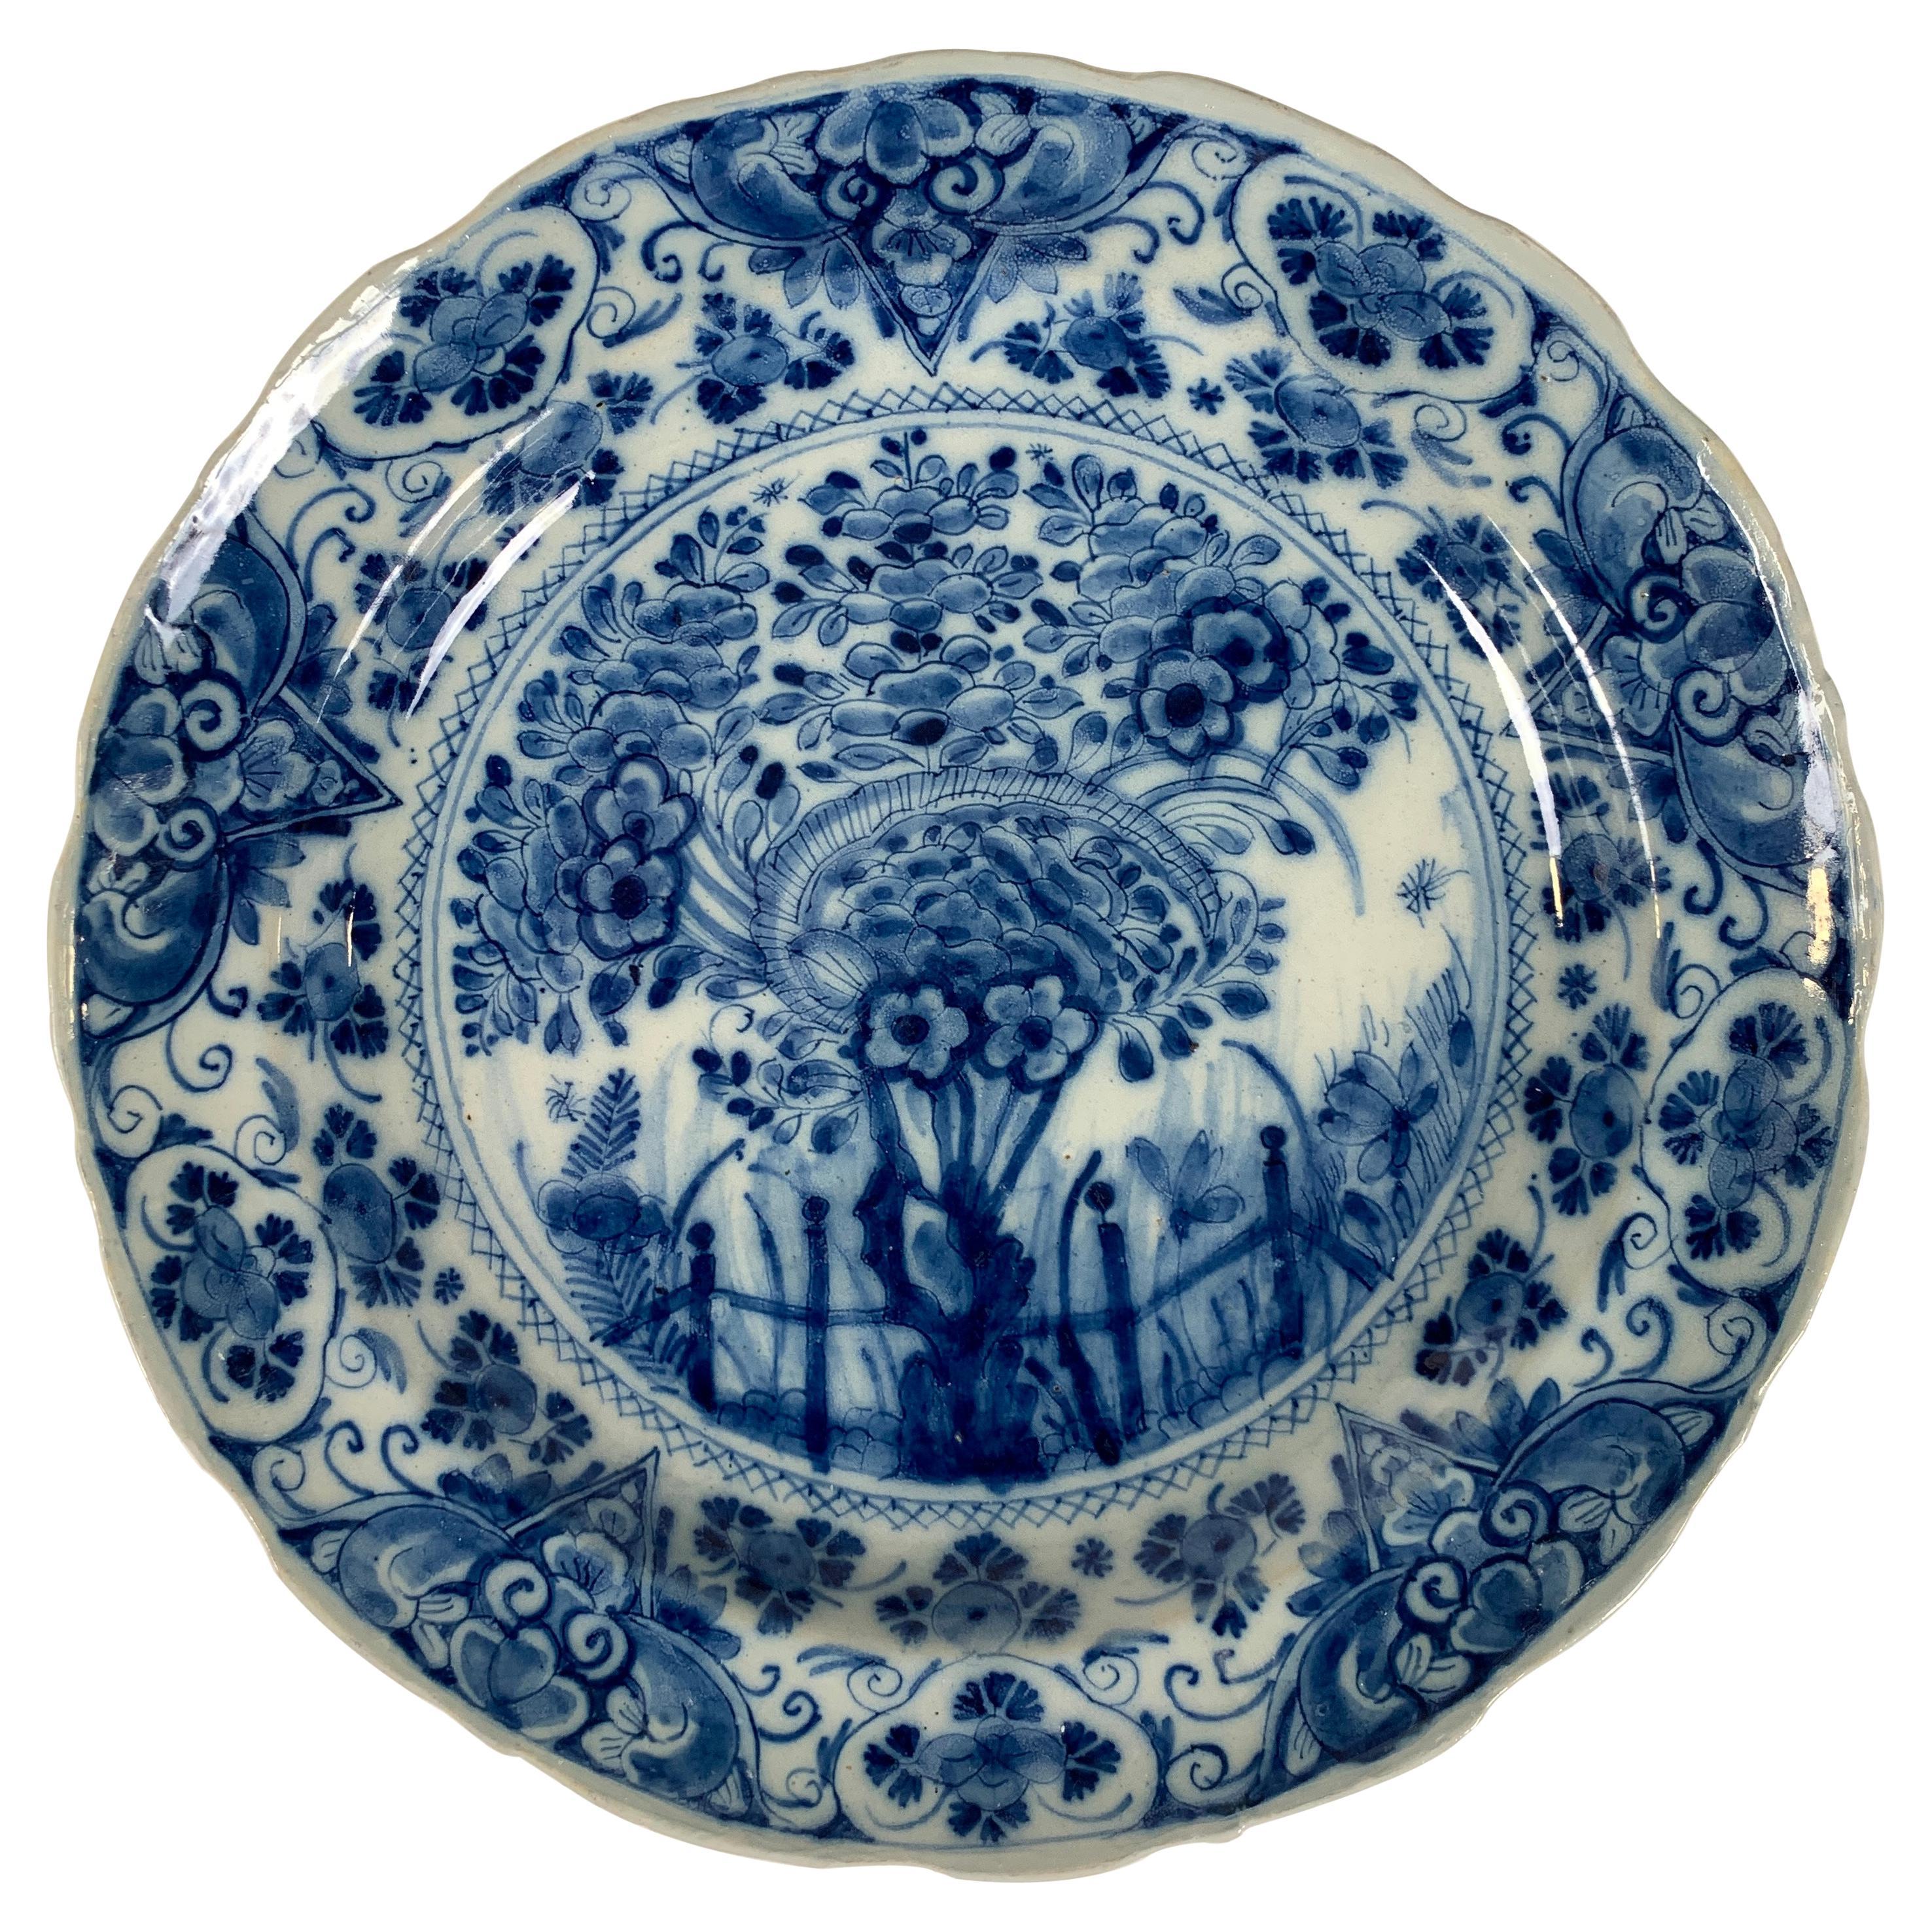 Blue and White Dutch Delft Dish Made, Circa 1760